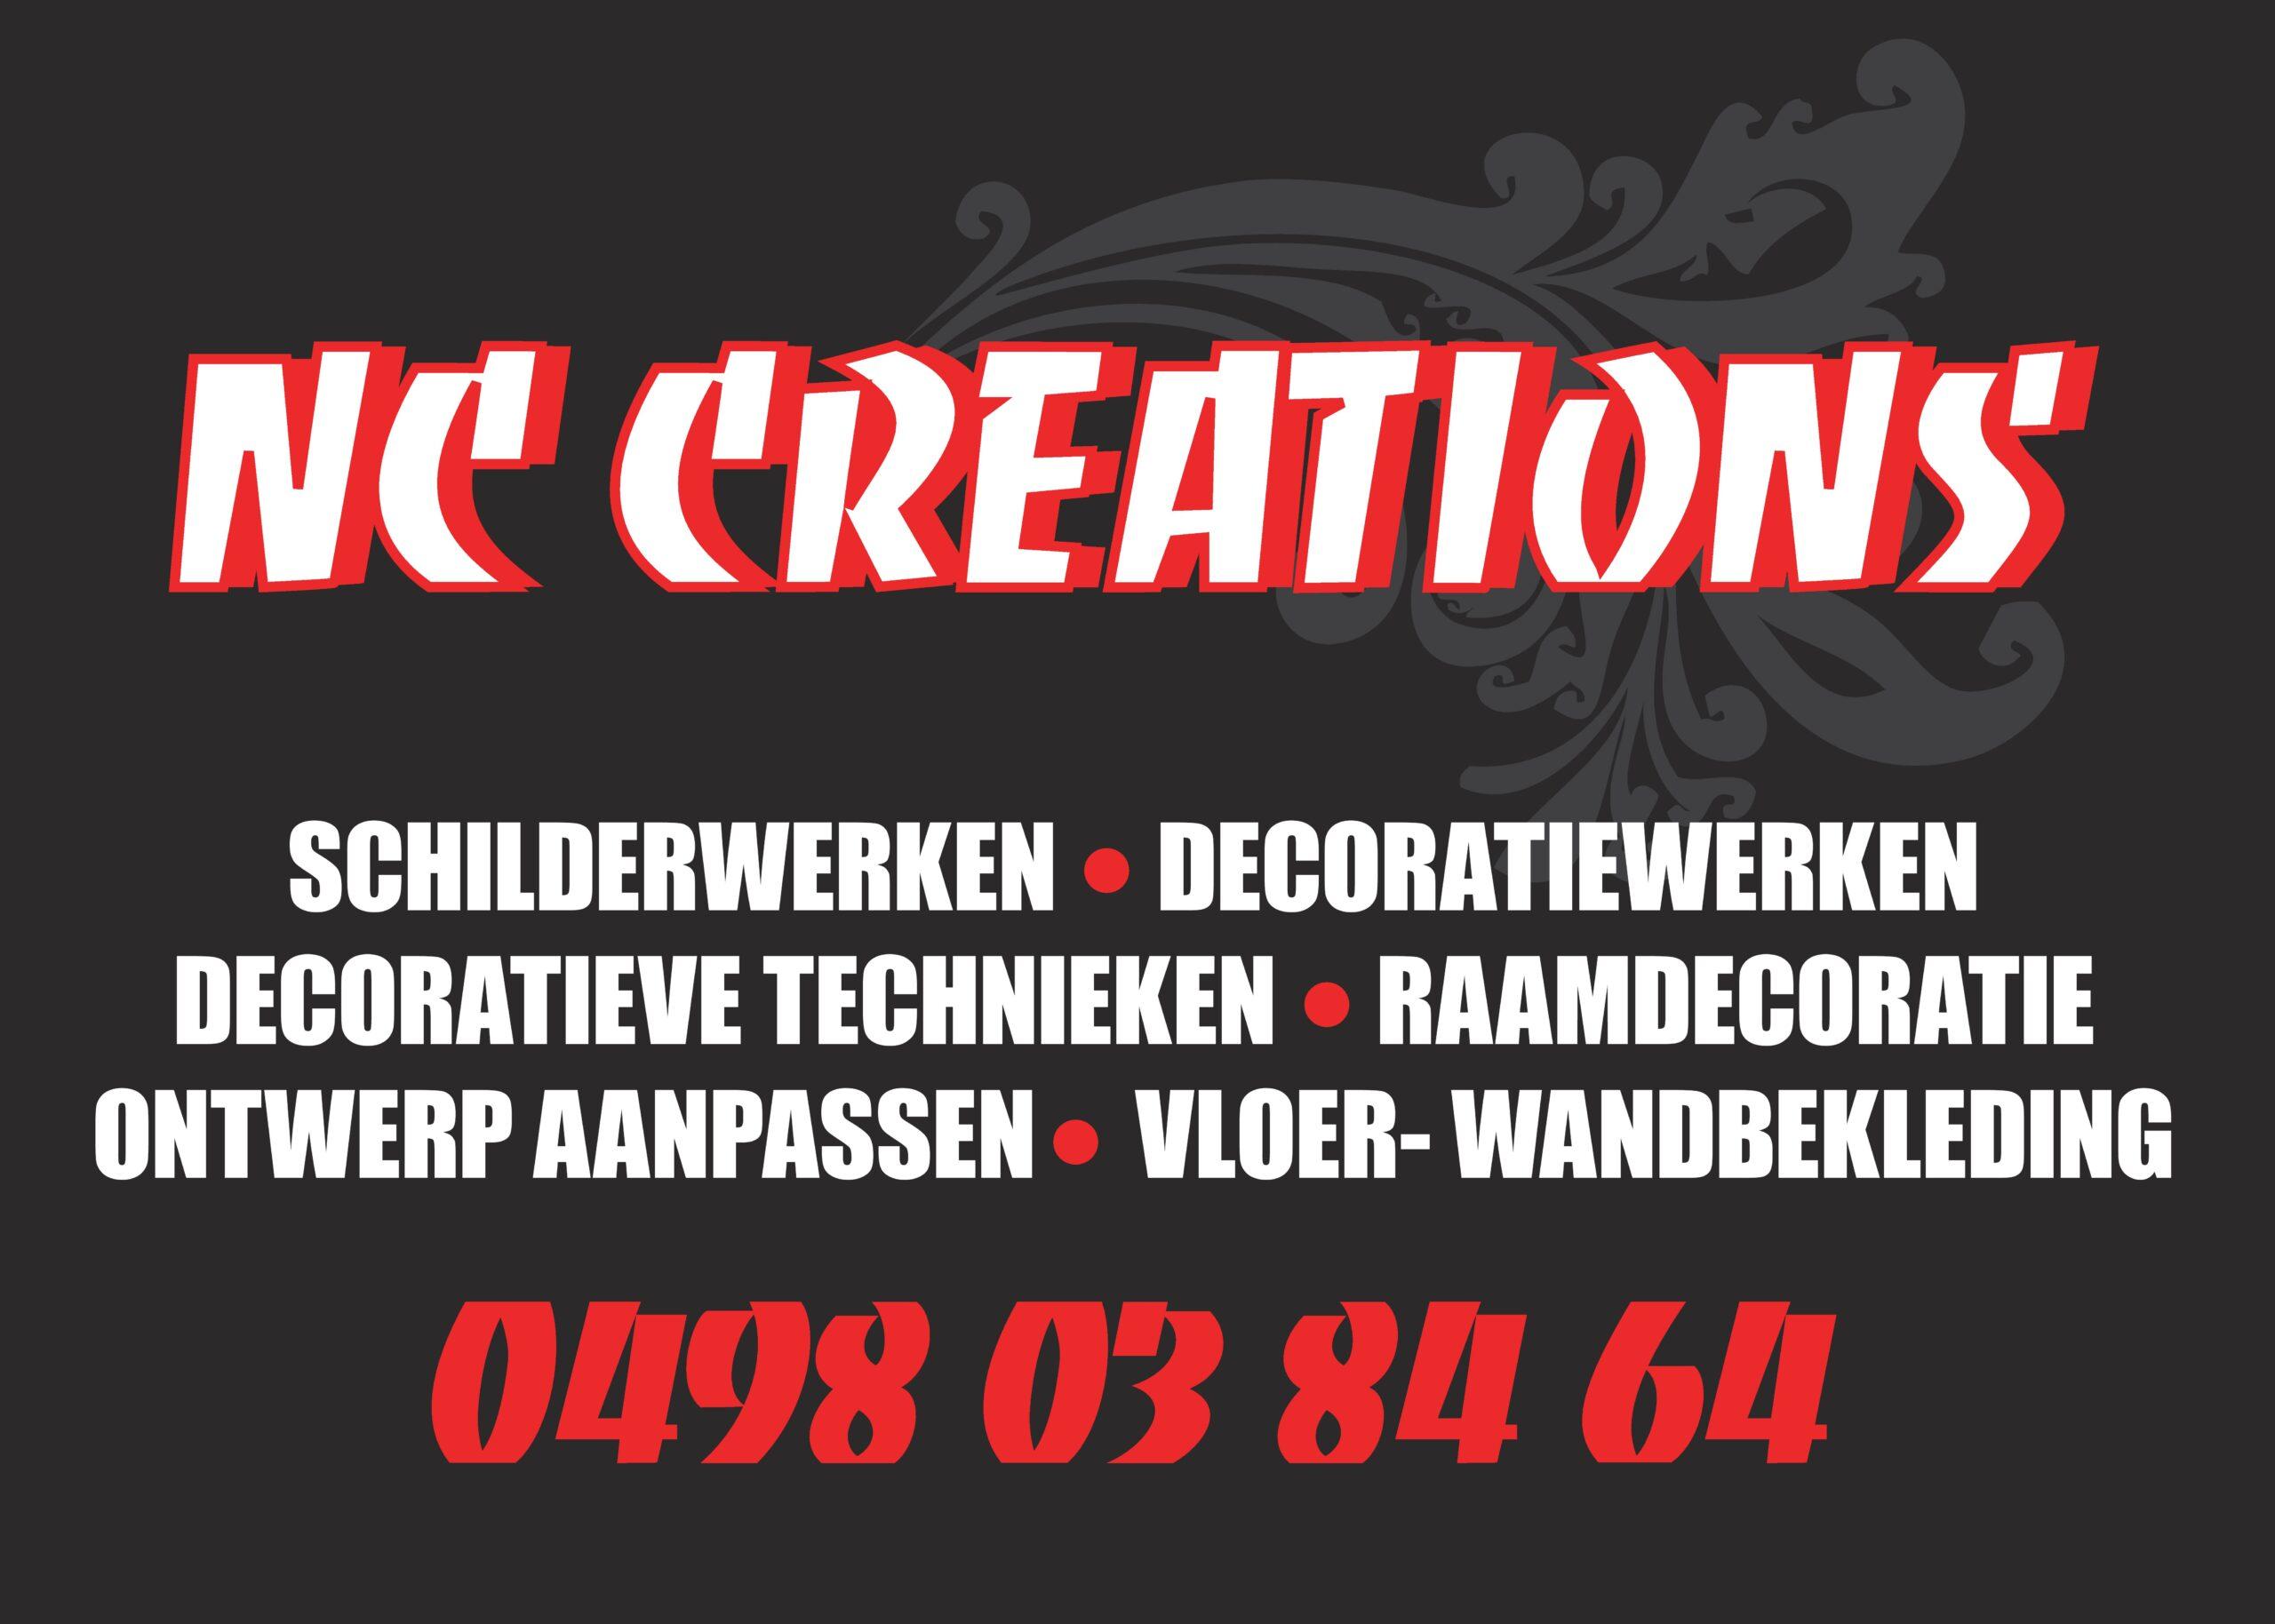 NC creations